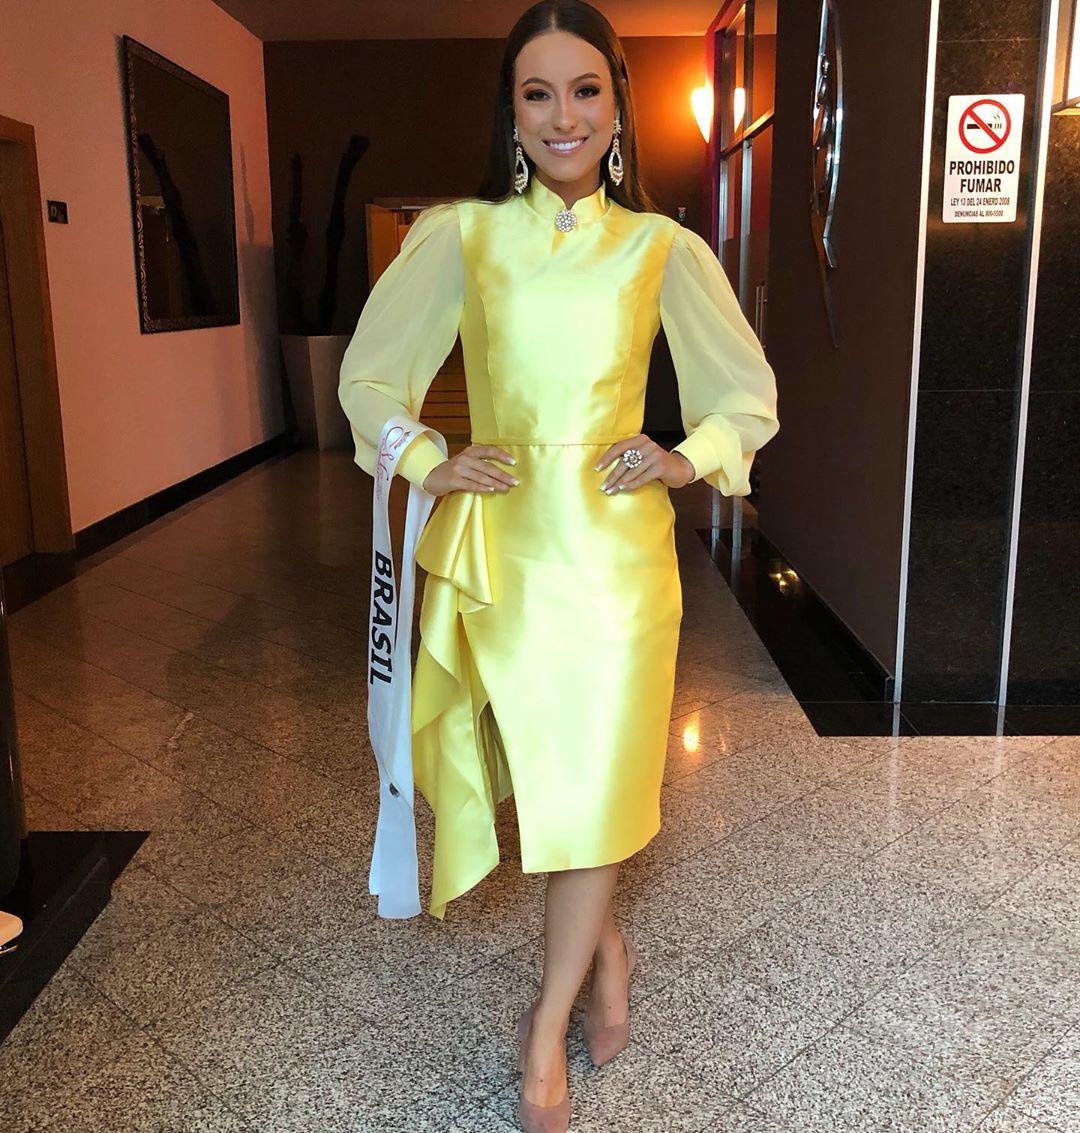 cristine boff sartor, segunda finalista de miss latinoamerica 2019. - Página 8 69840710